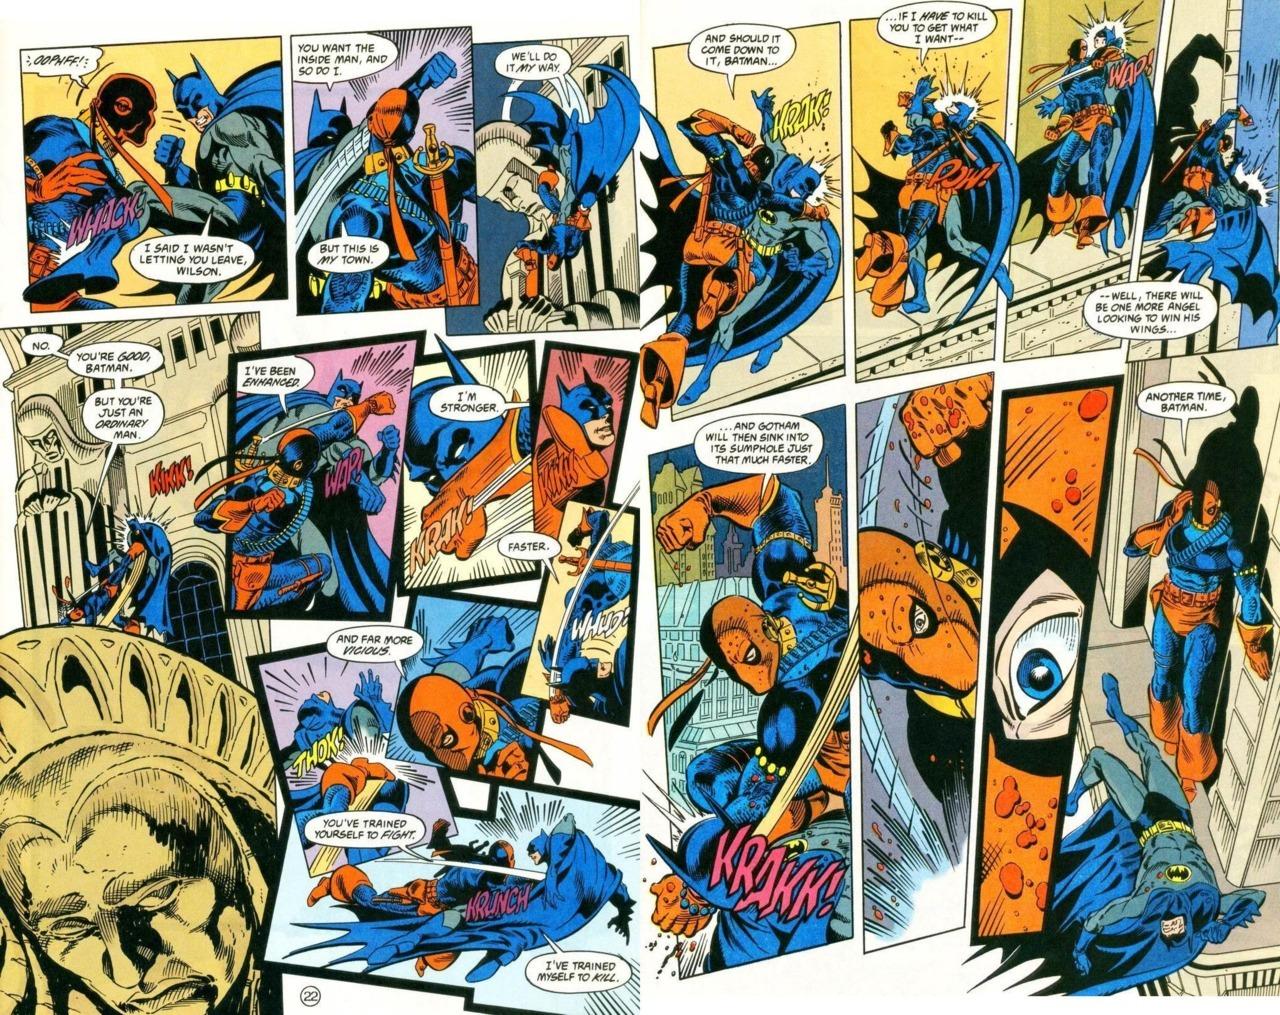 Manganiello to antagonize Affleck's Batman as Deathstroke